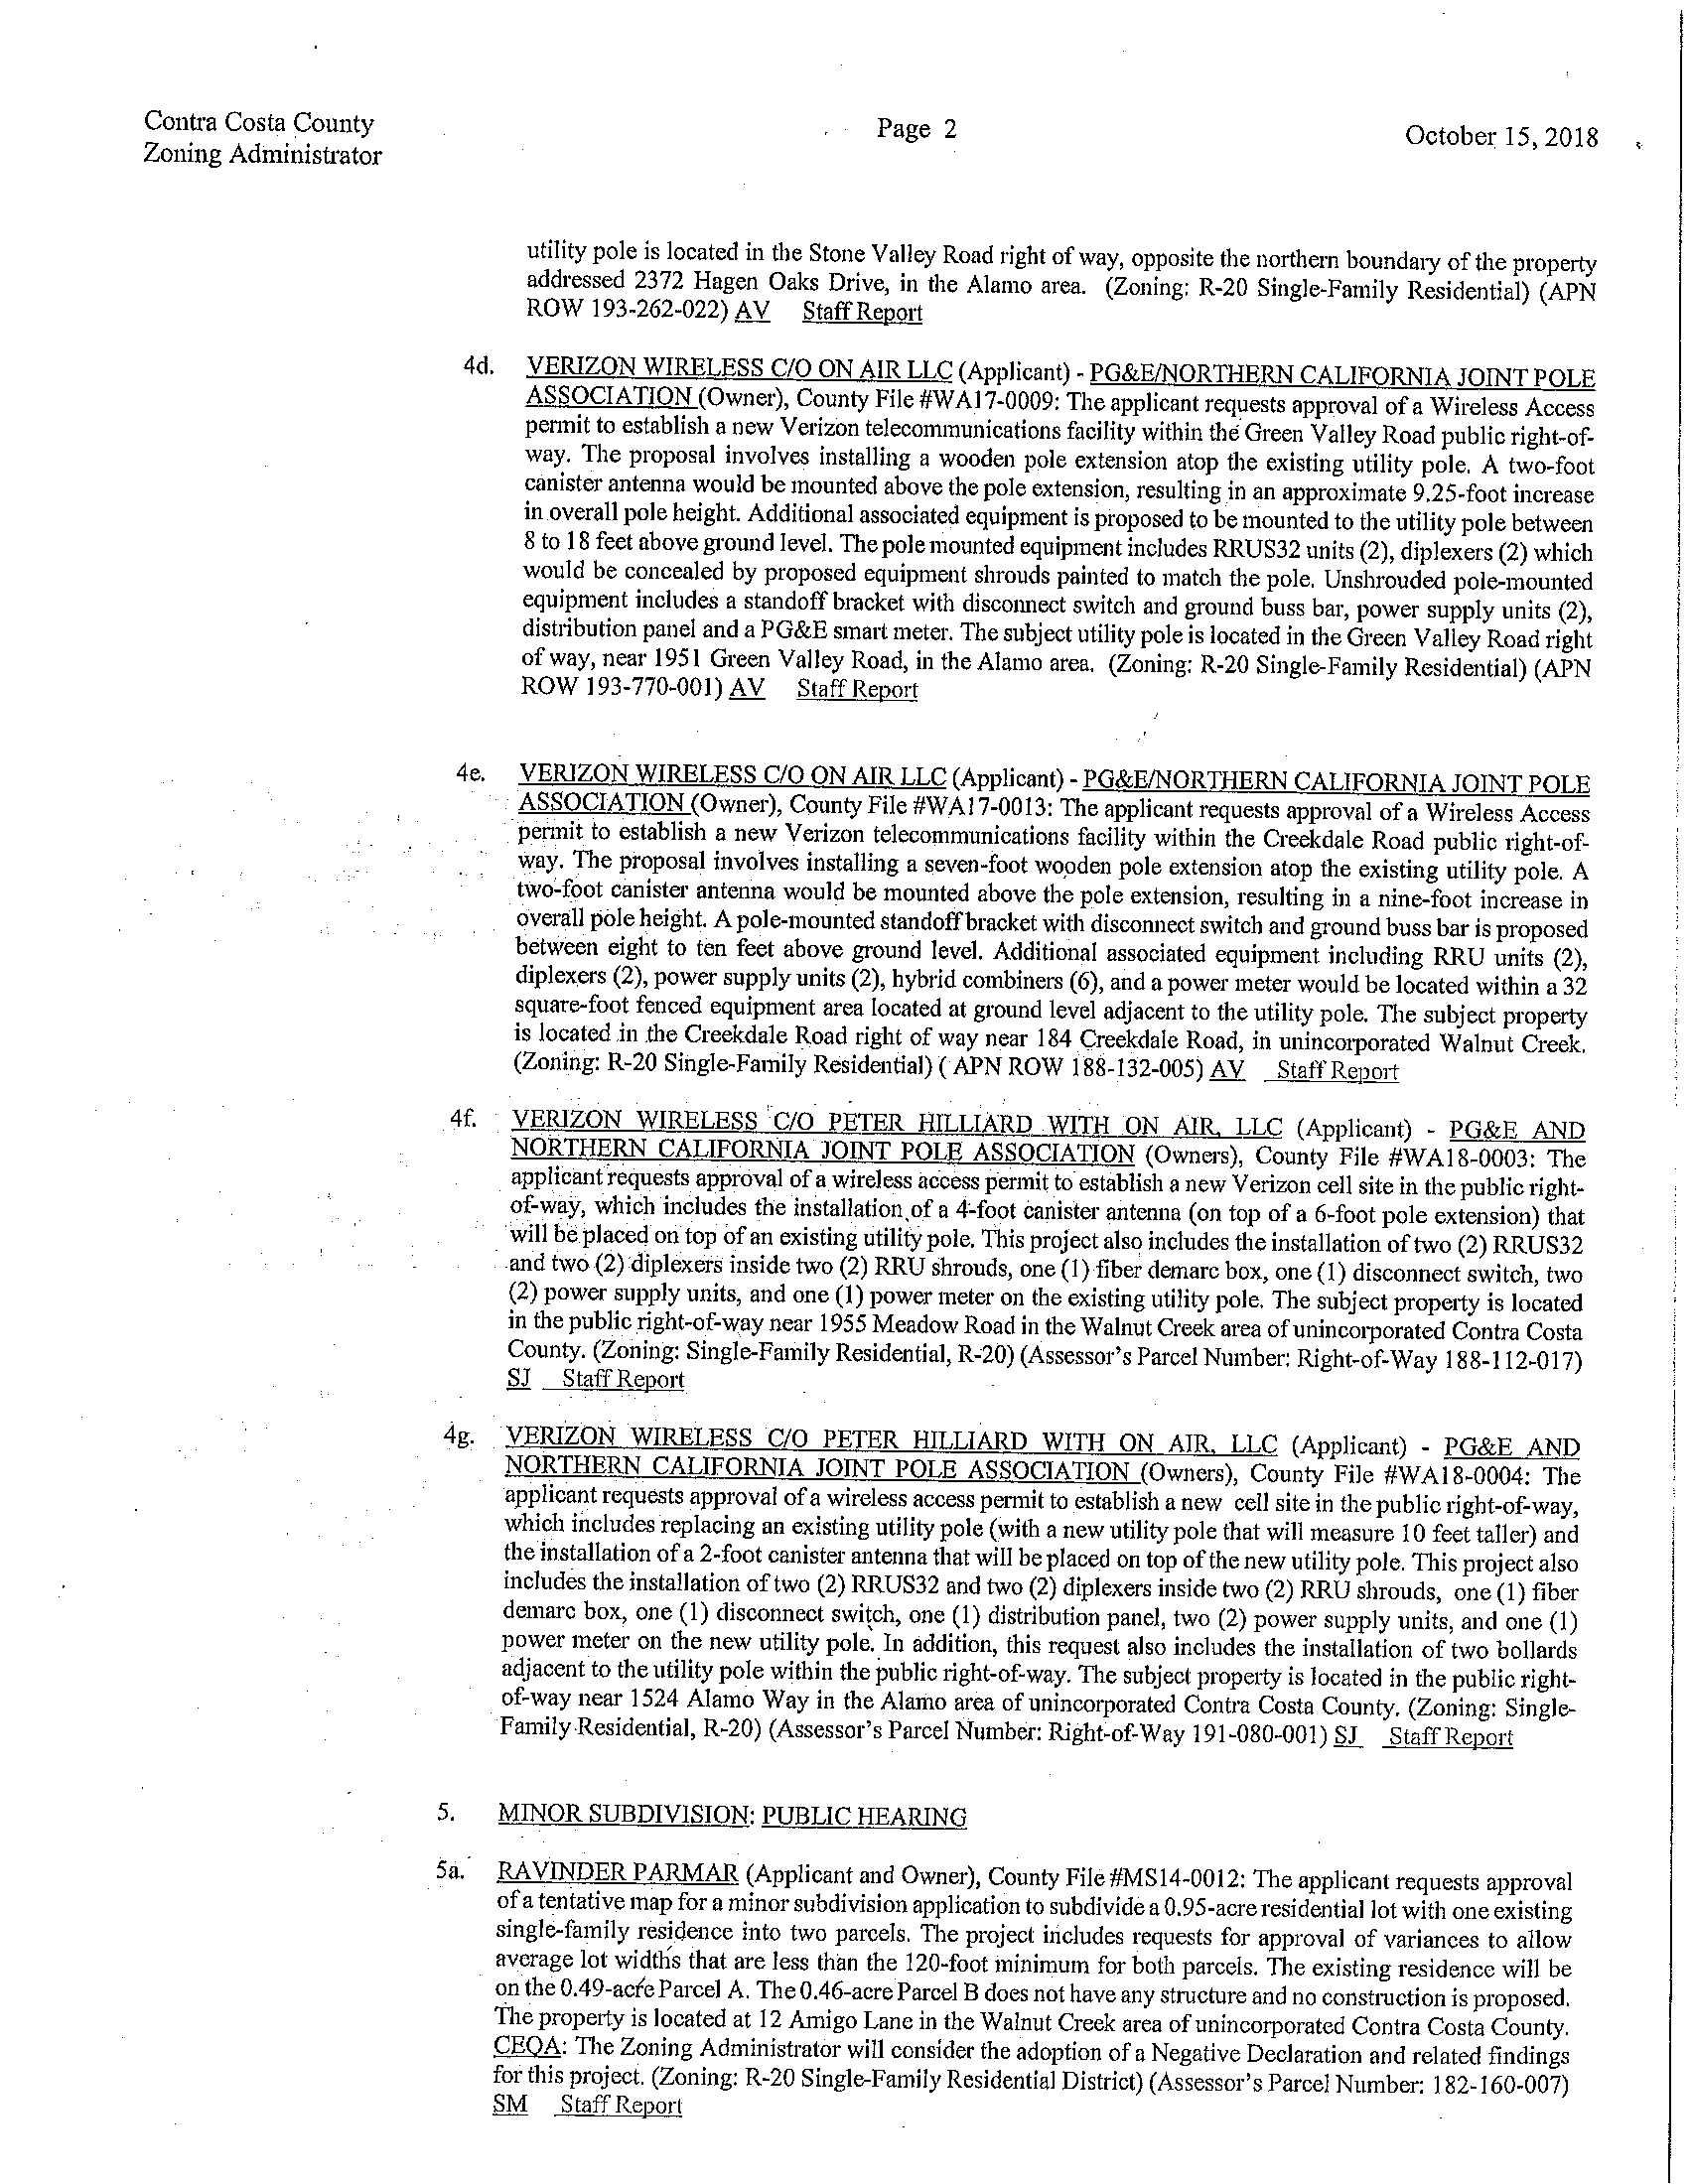 ESMAC Agenda 11.14.2018 (46 Pages)_41.jpg